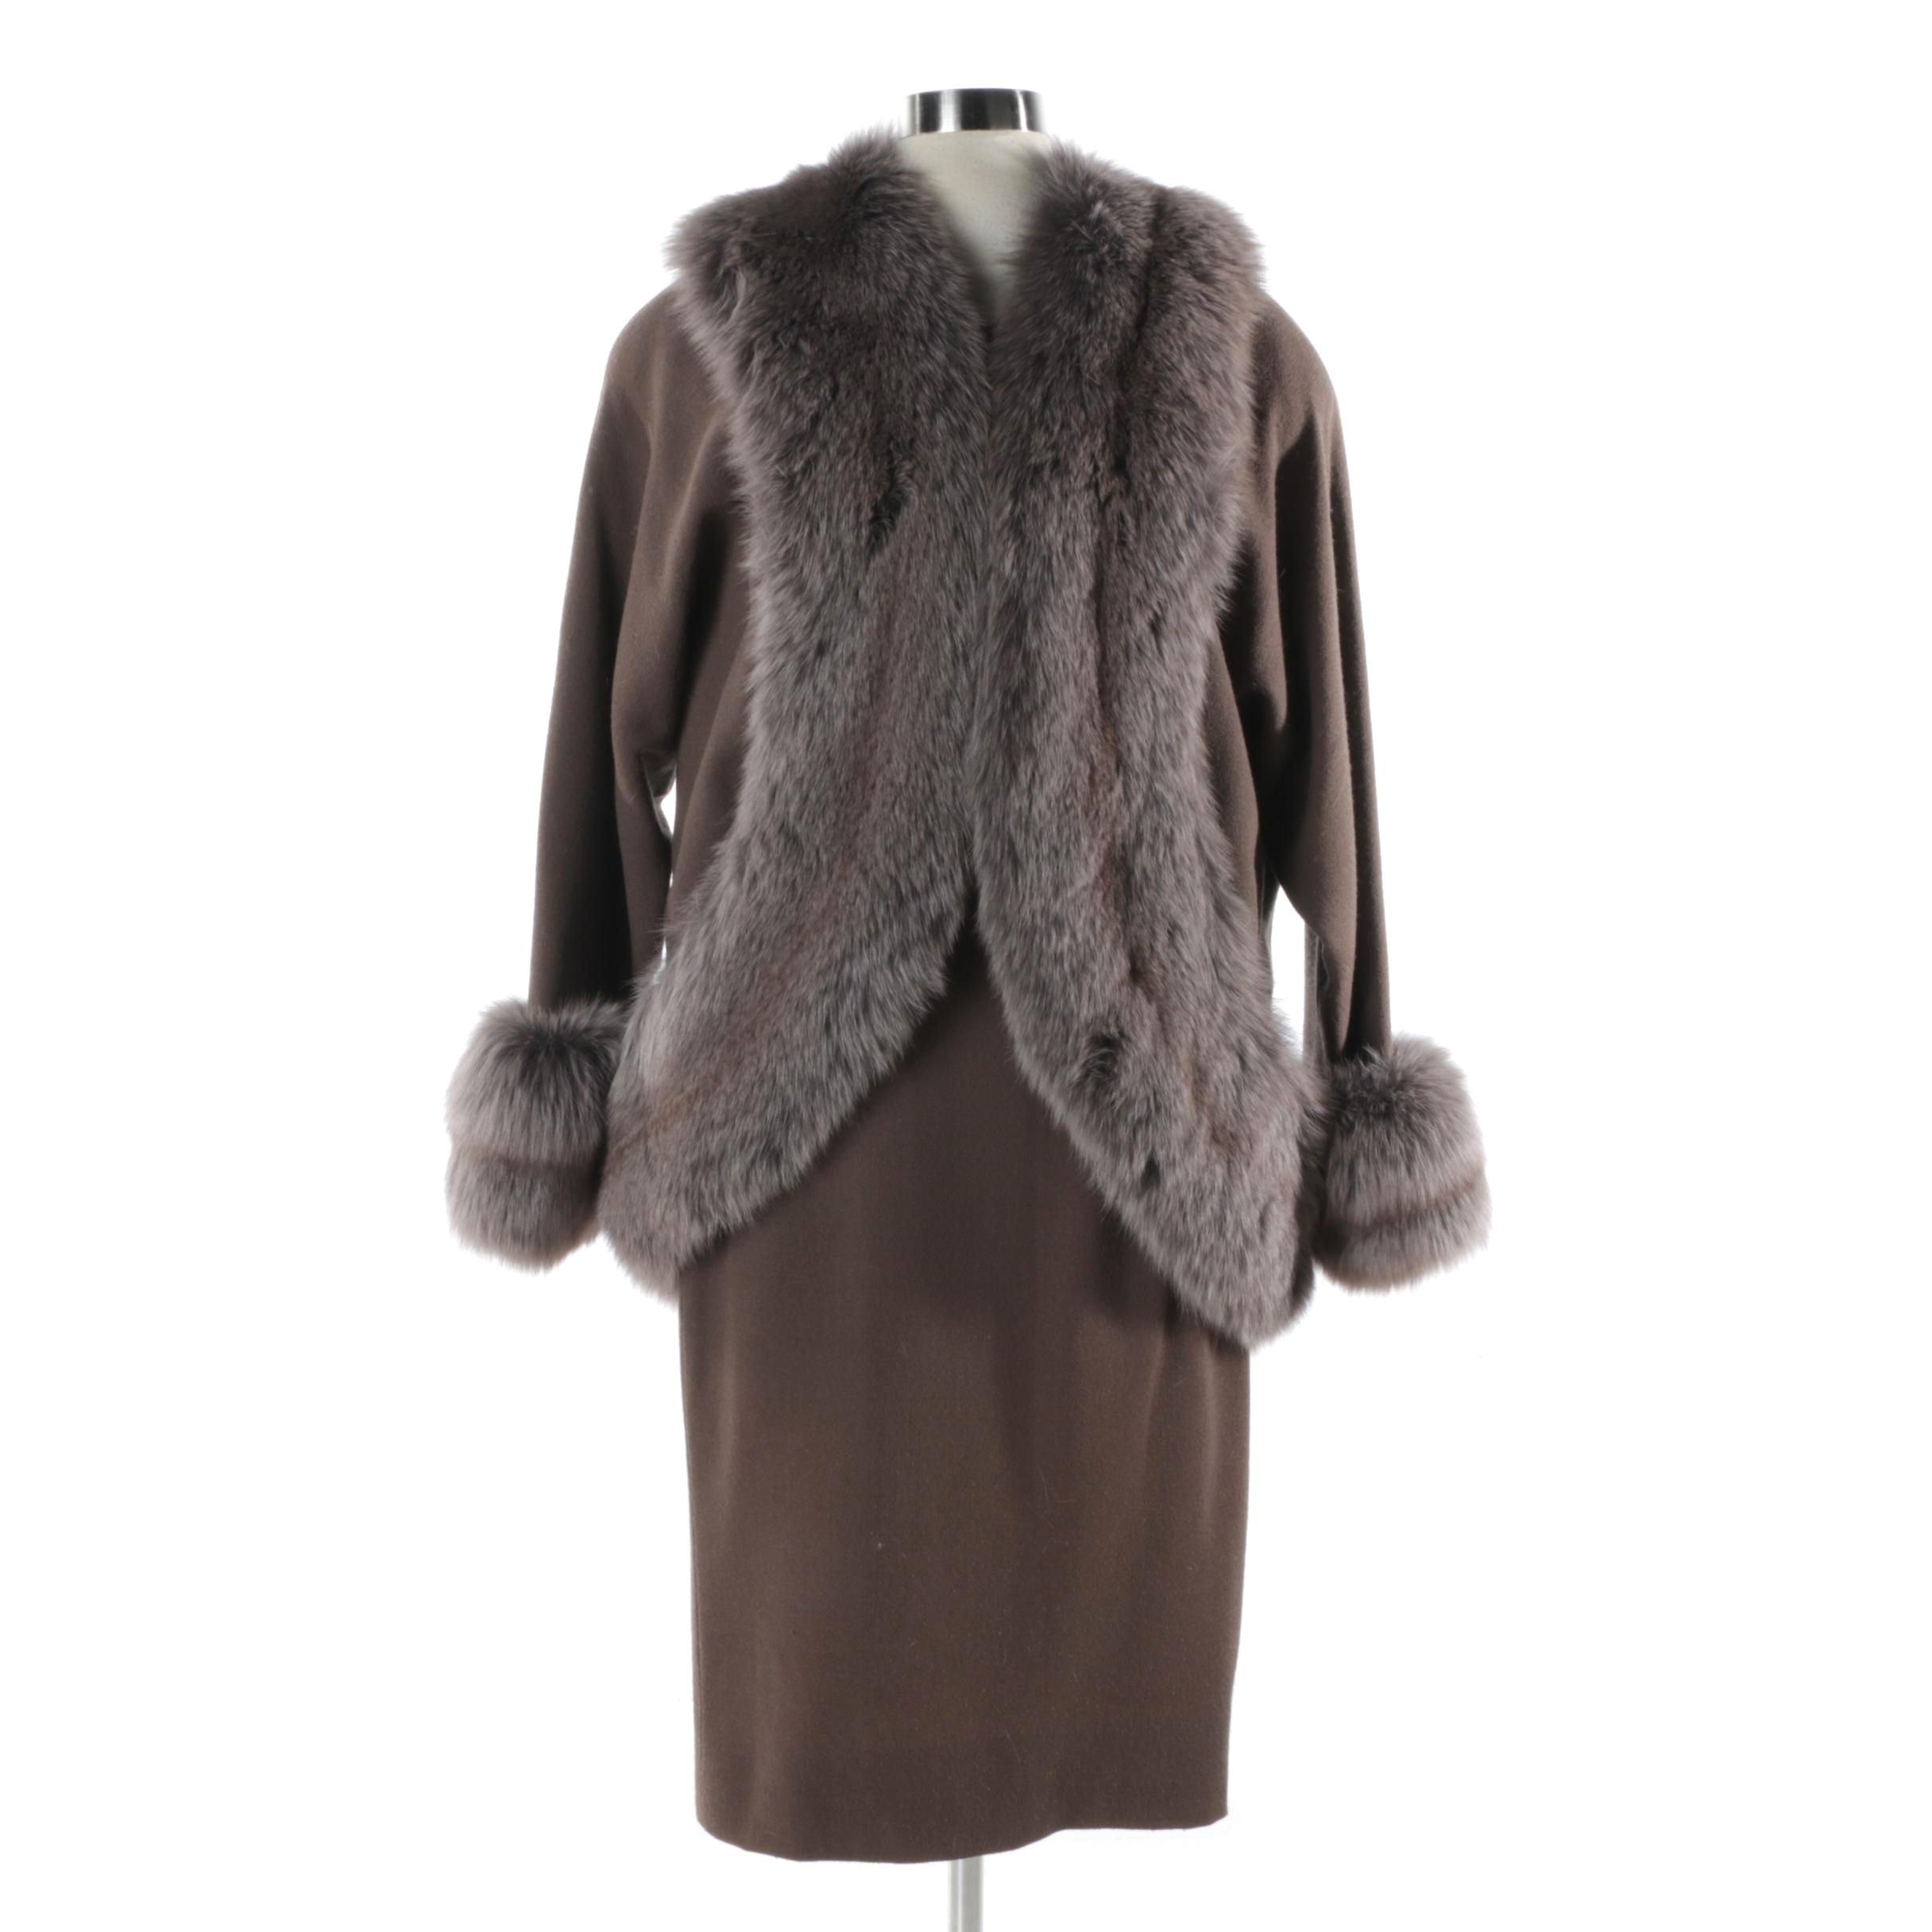 Circa 1960s Vintage Travilla Dress and Jacket with Fox Fur Trim